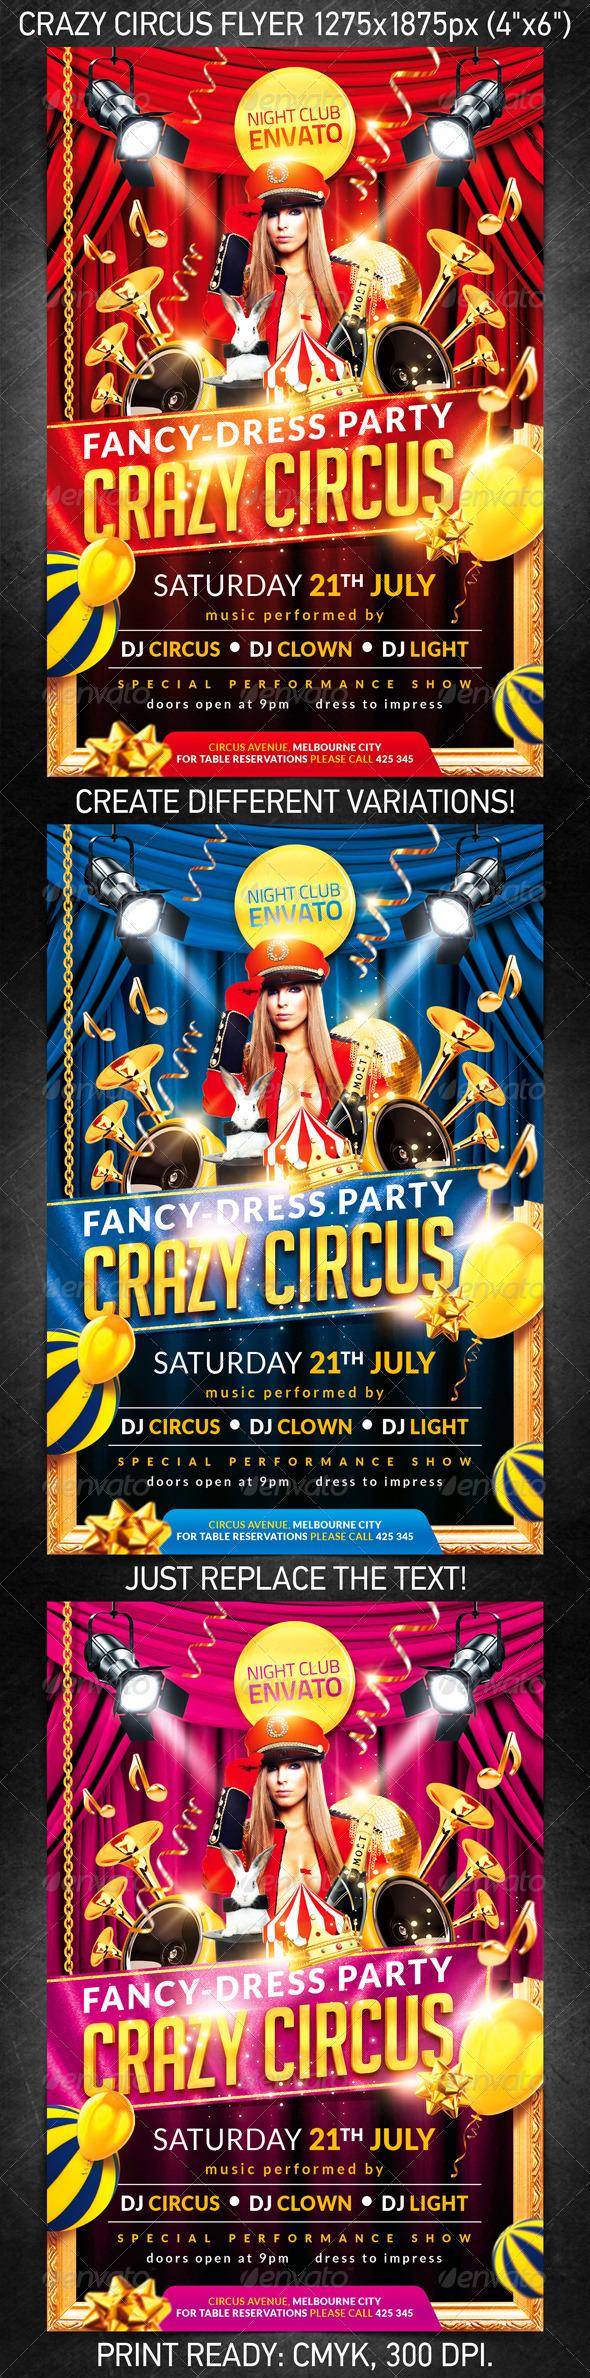 GraphicRiver Crazy circus party flyer 2656772